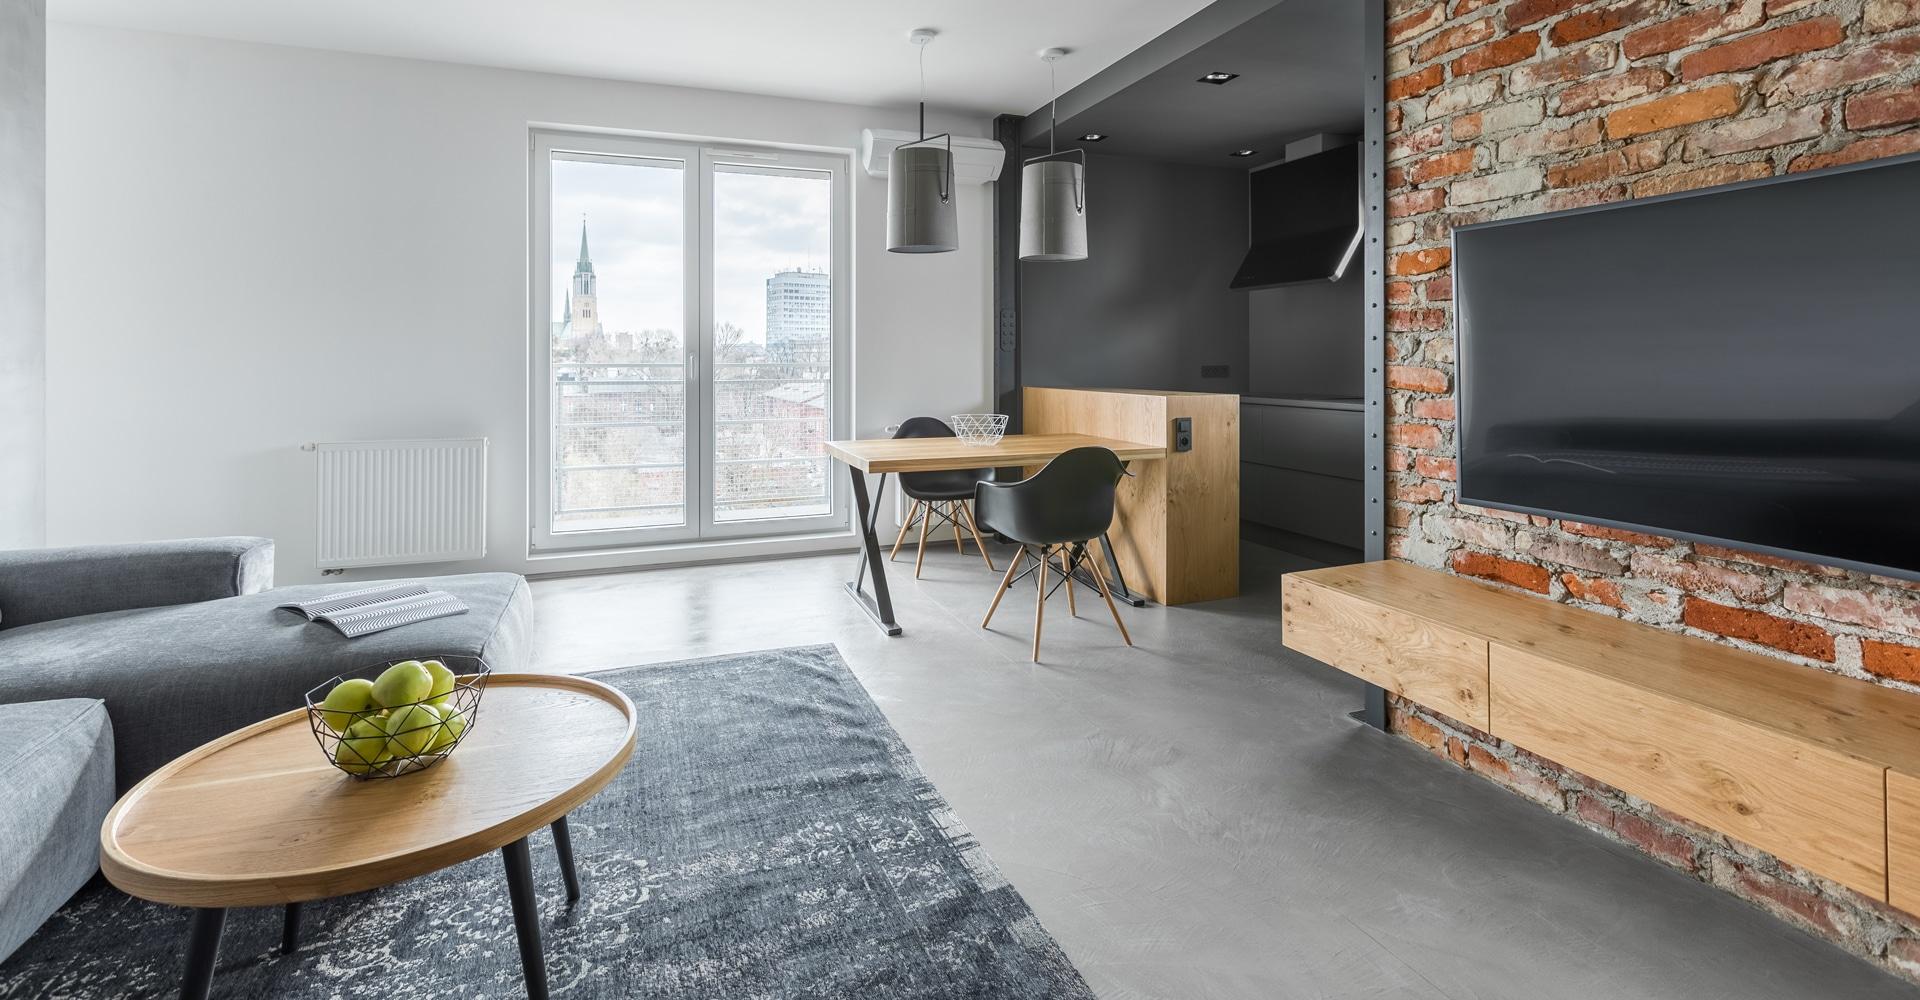 Cementgebonden gietvloer in woonkamer